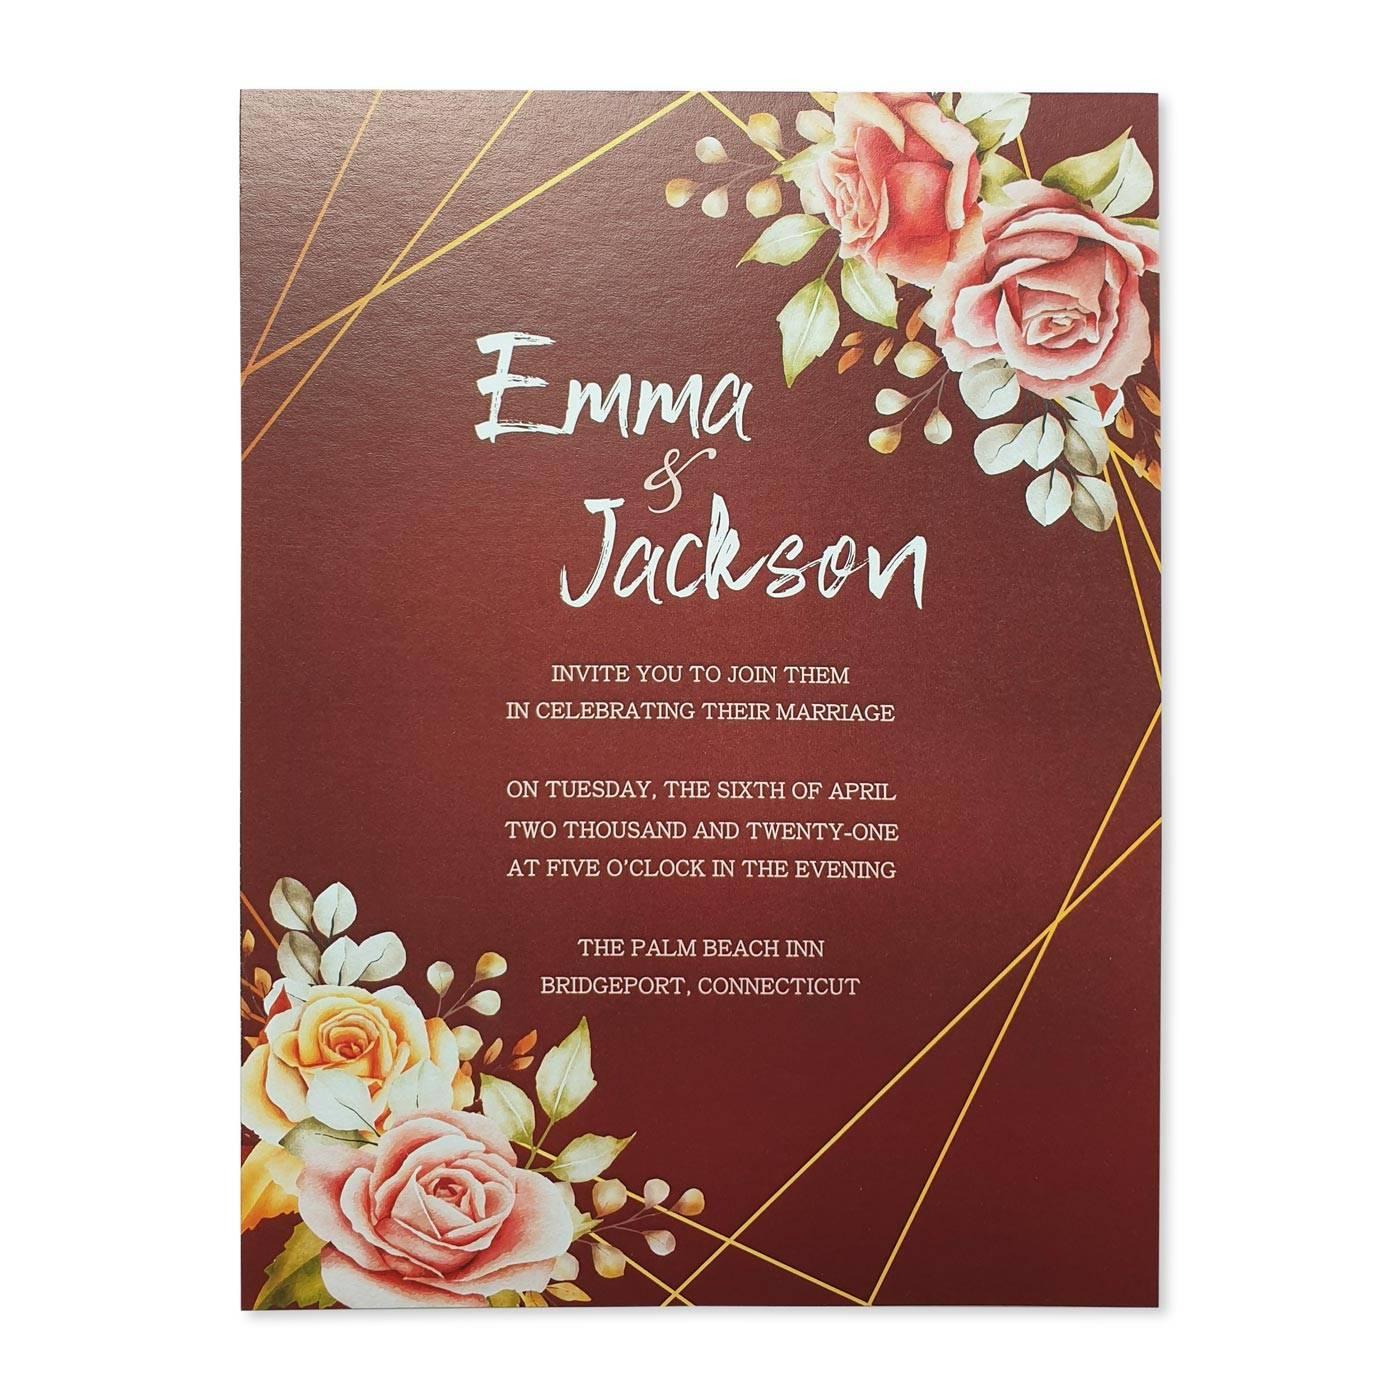 WHITE SHIMMERY FLORAL THEMED - SCREEN PRINTED WEDDING INVITATION : REDWOOD_JARDINIER - 123WeddingCards